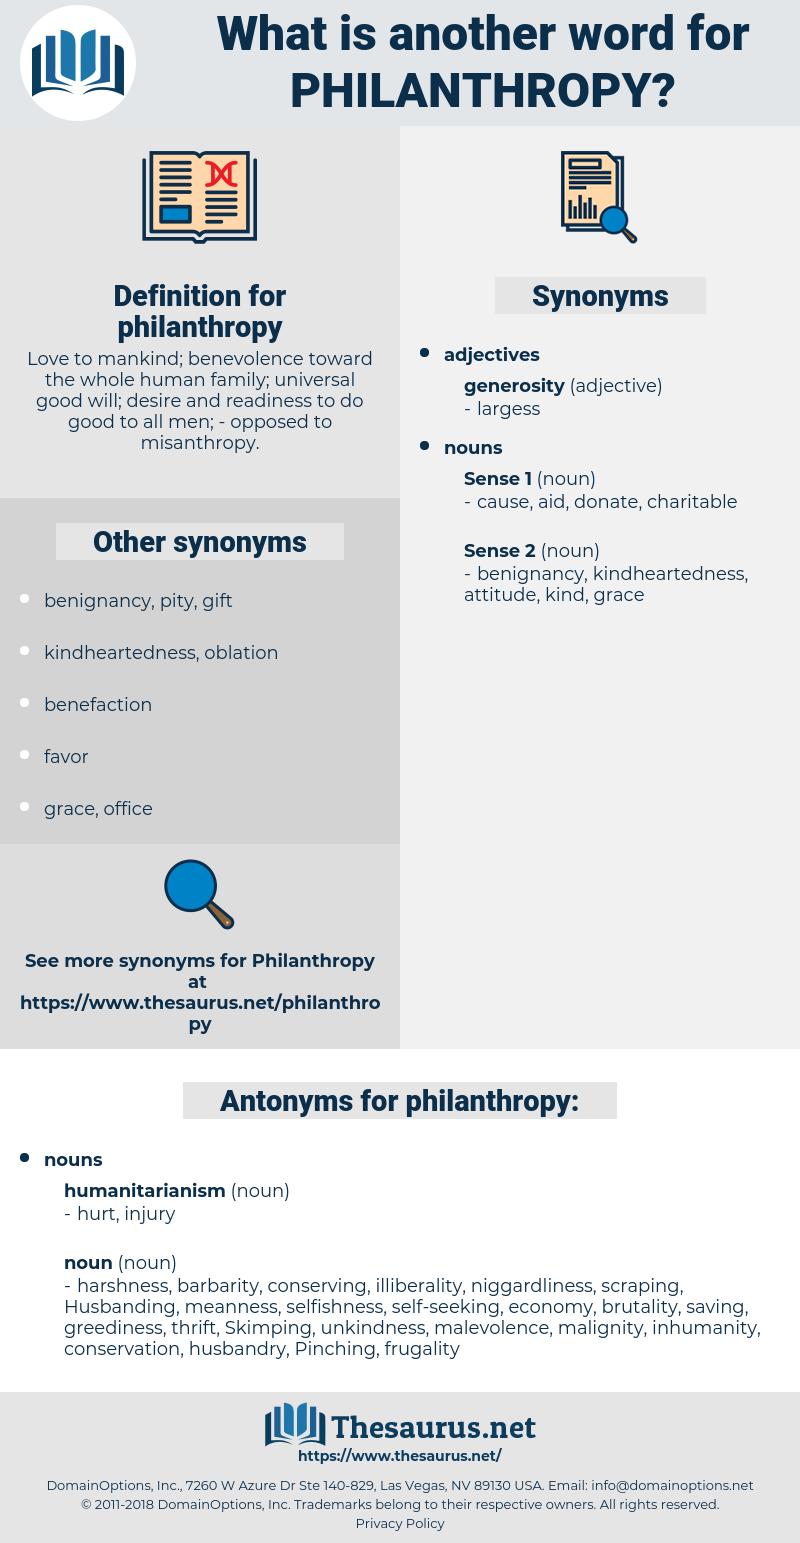 philanthropy, synonym philanthropy, another word for philanthropy, words like philanthropy, thesaurus philanthropy